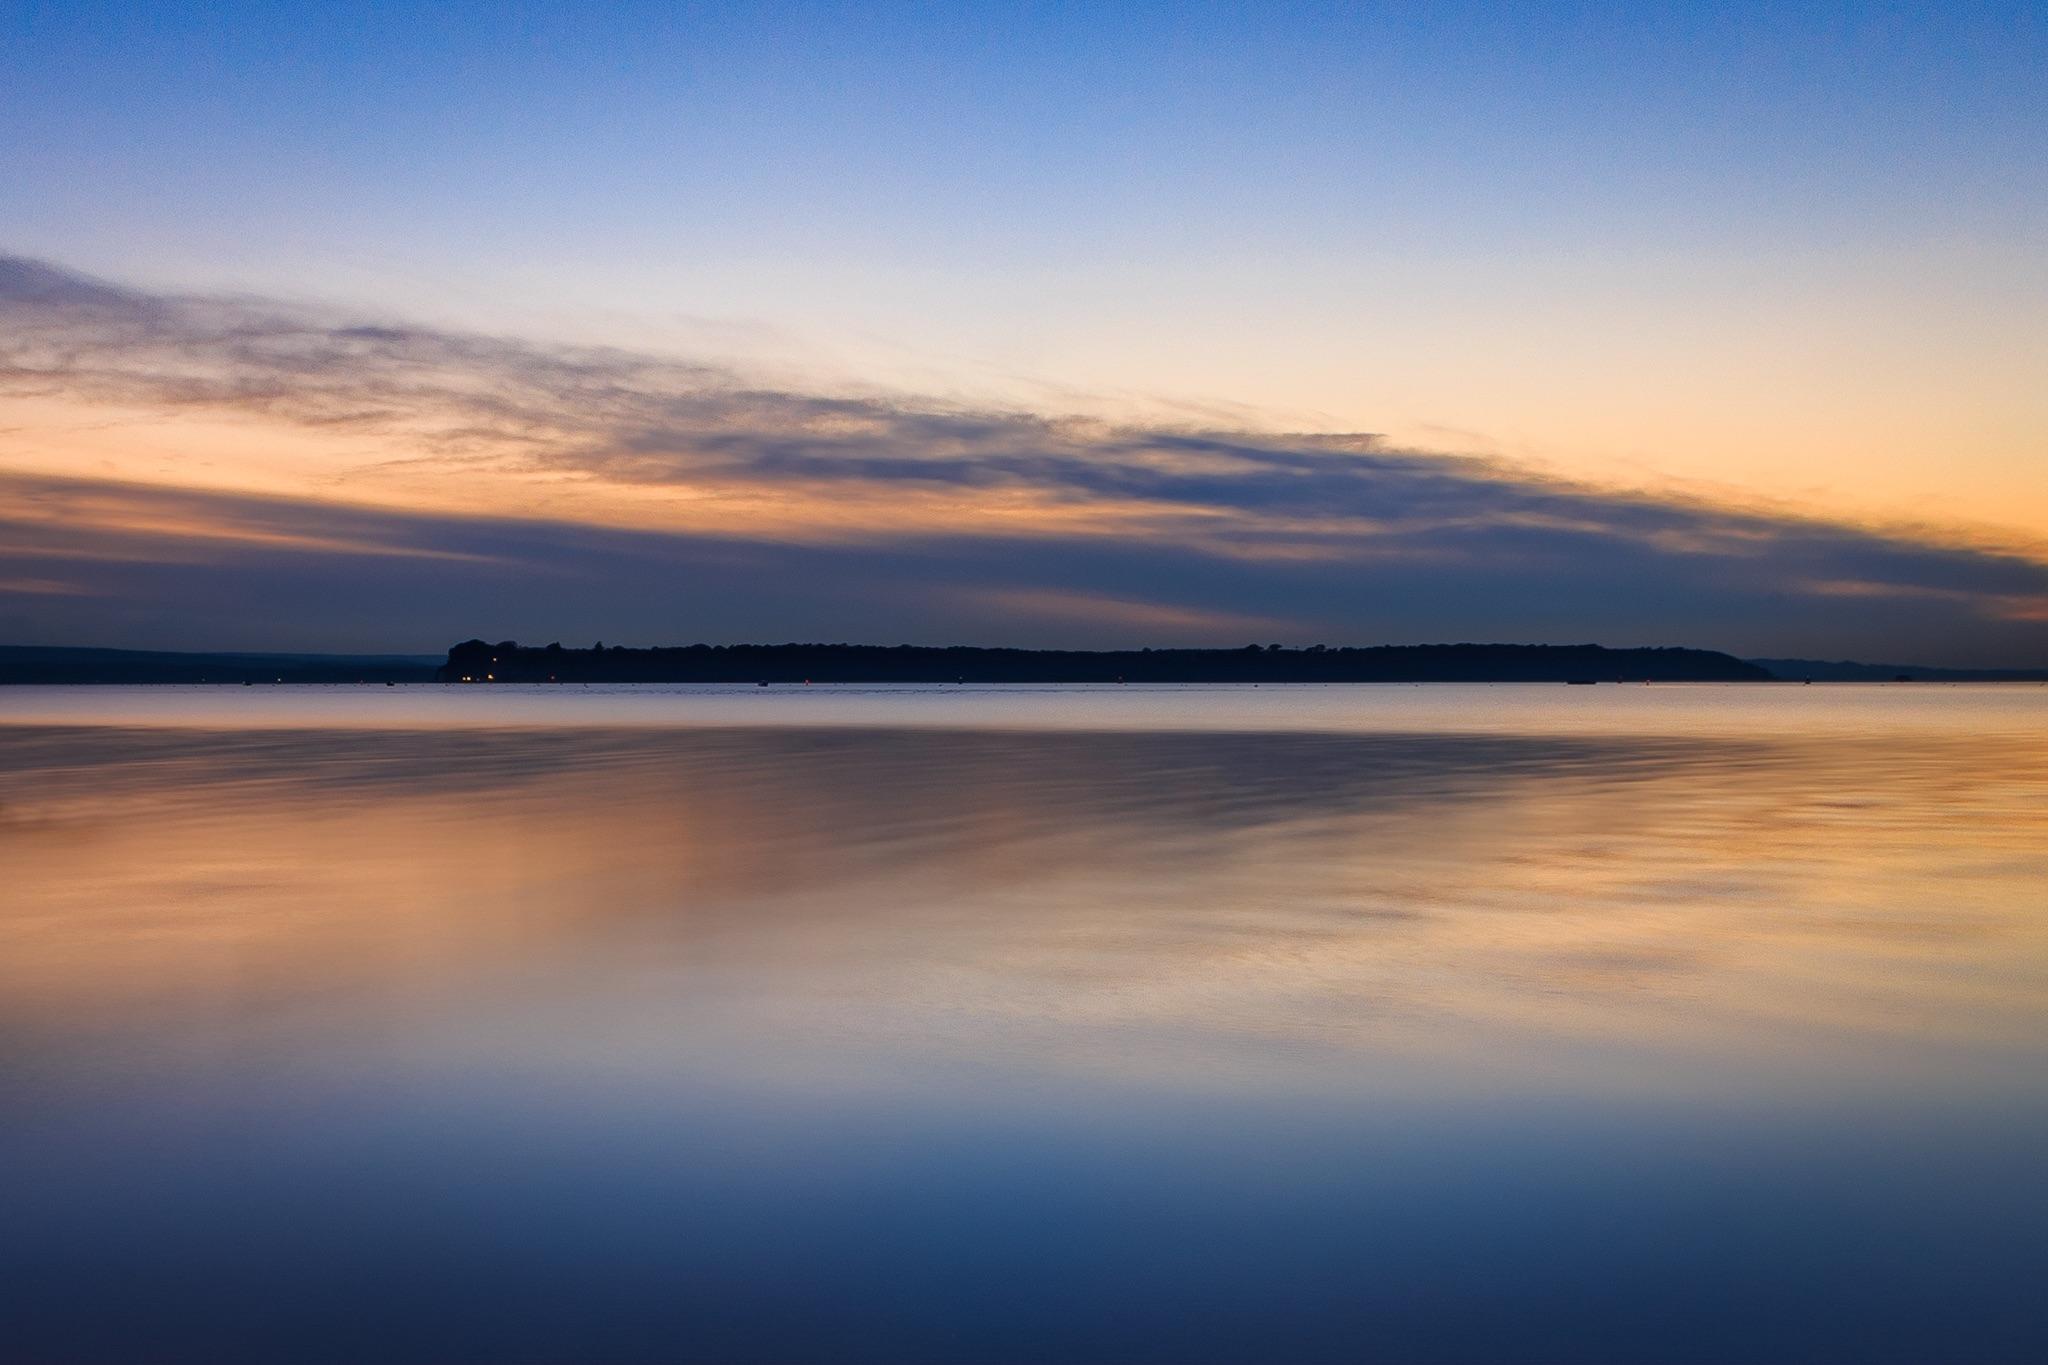 Brownsea Island at sunset